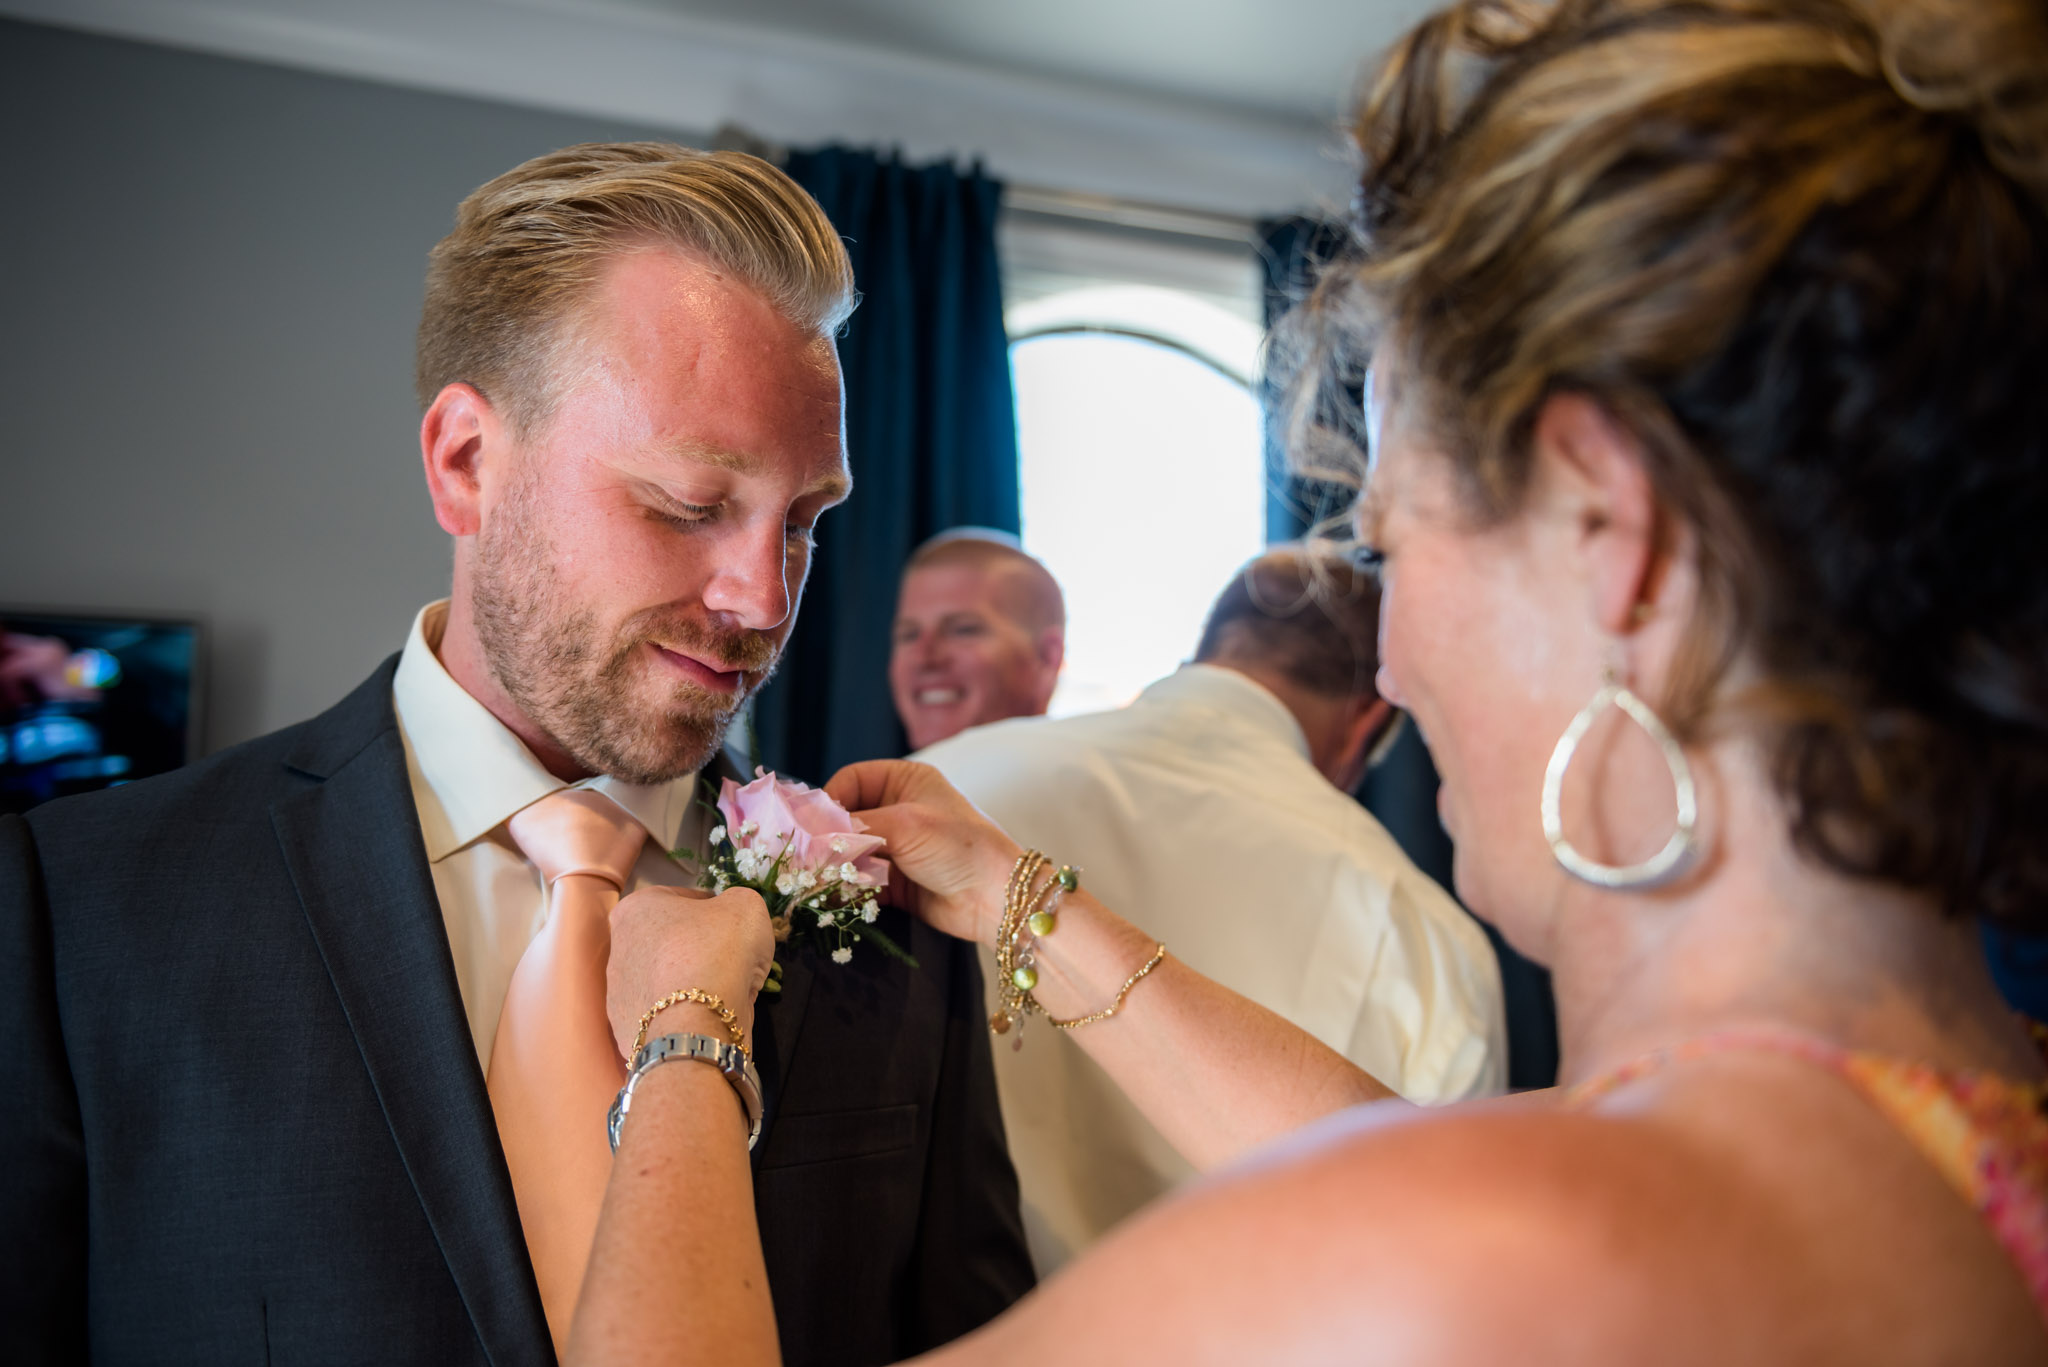 Avensole-Winery-Temecula-Wedding-Josh-and-Olivia-3323.JPG